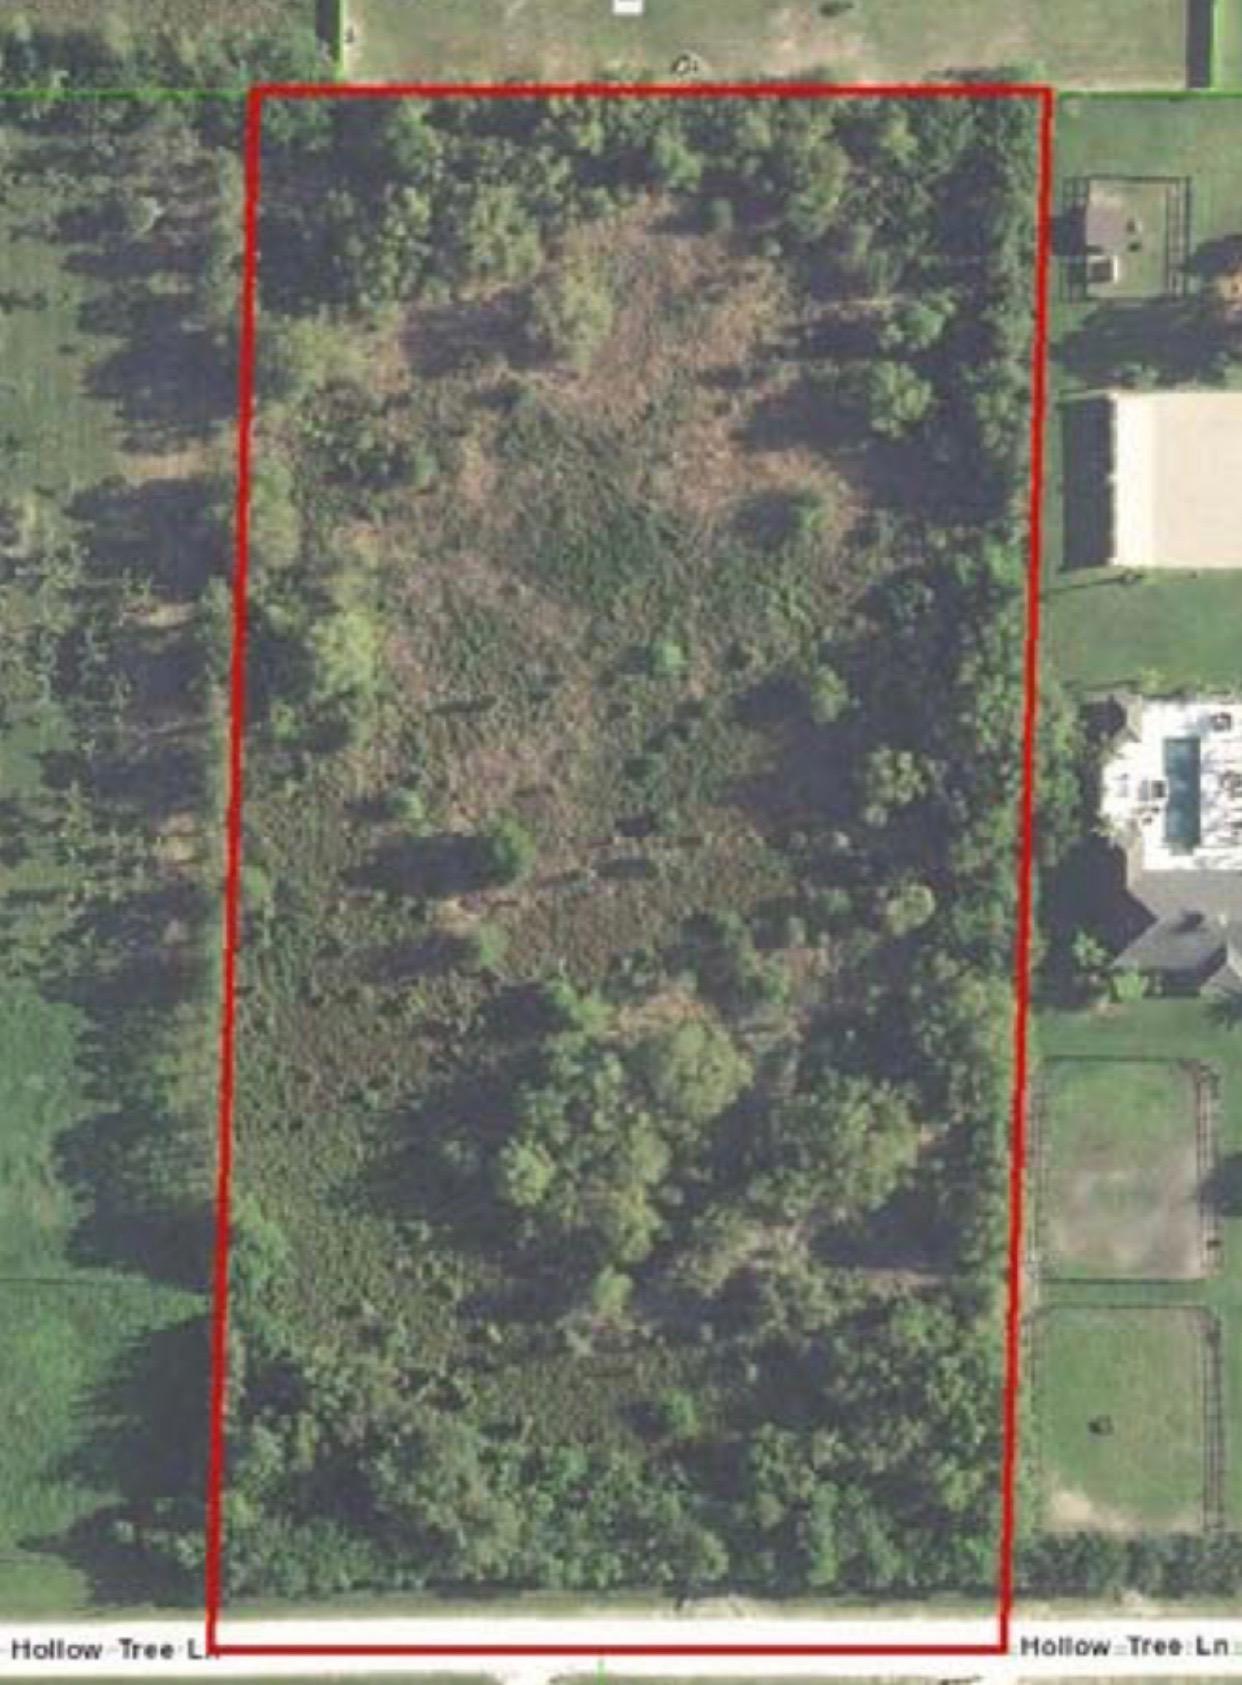 16425 Hollow Tree Lane - Wellington, Florida